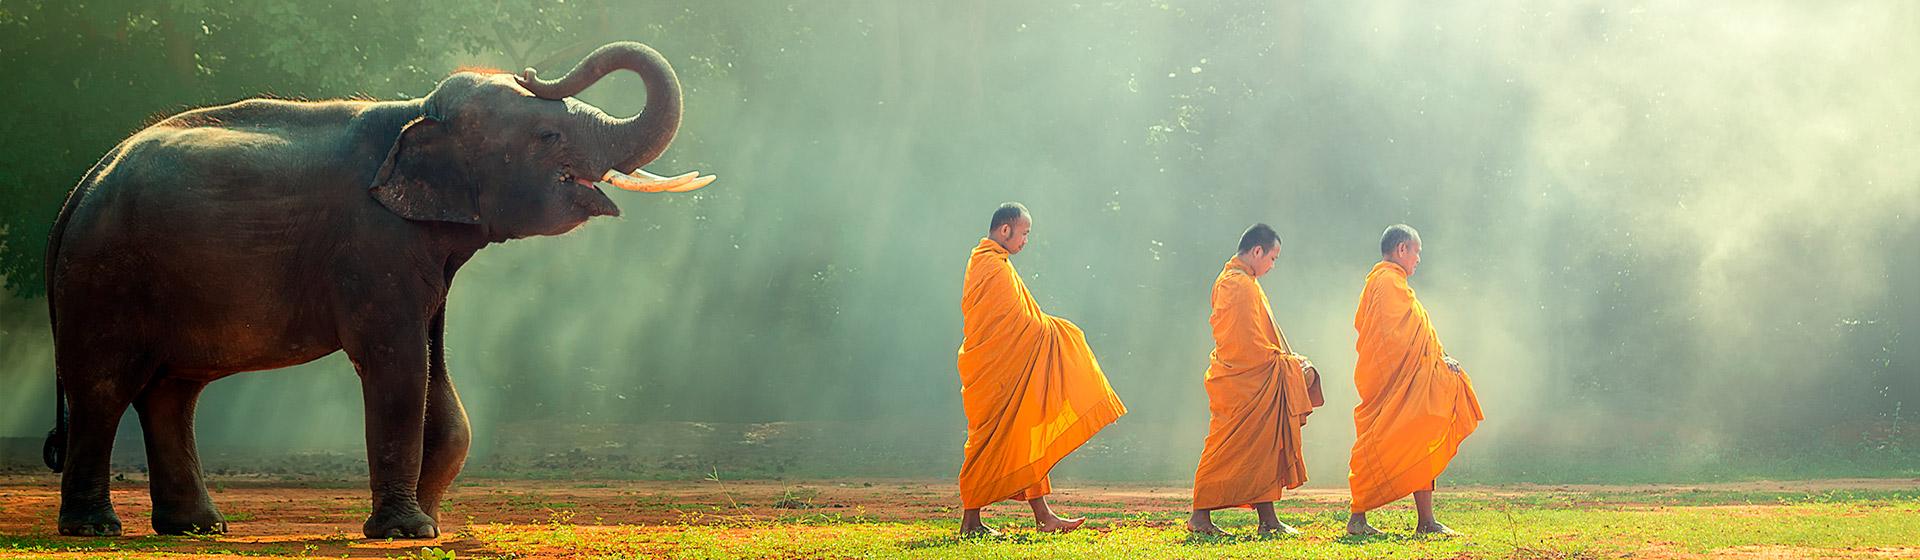 Ofertas de viajes a Thailandia